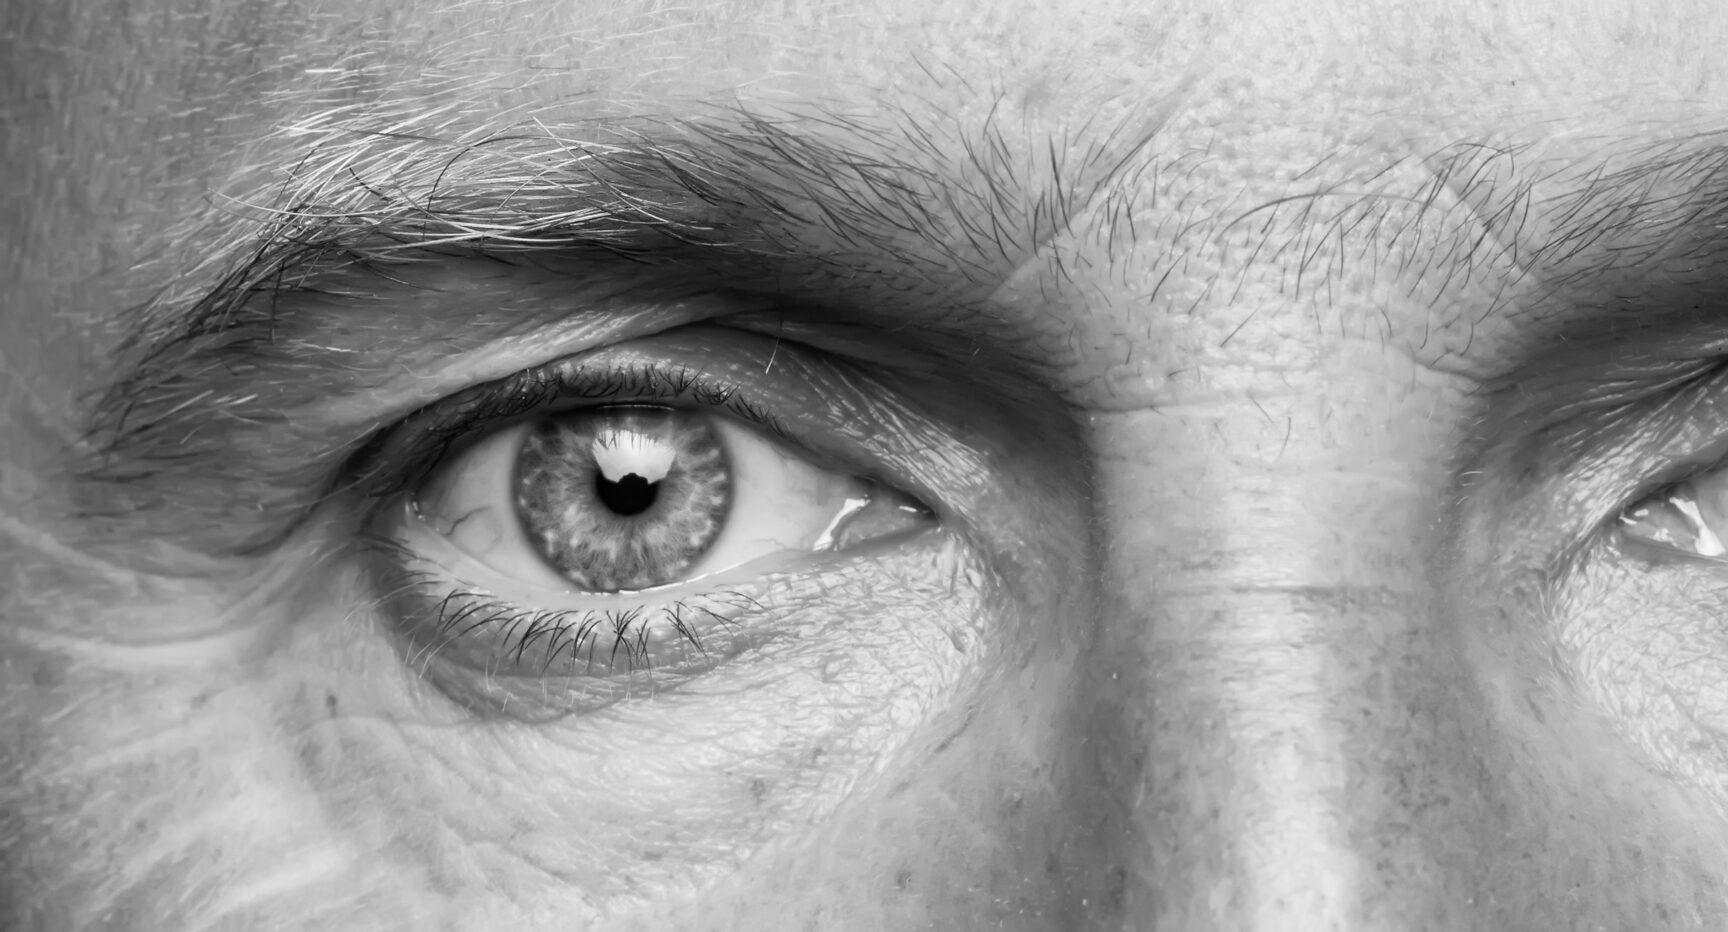 Male face. Blepharoplasty